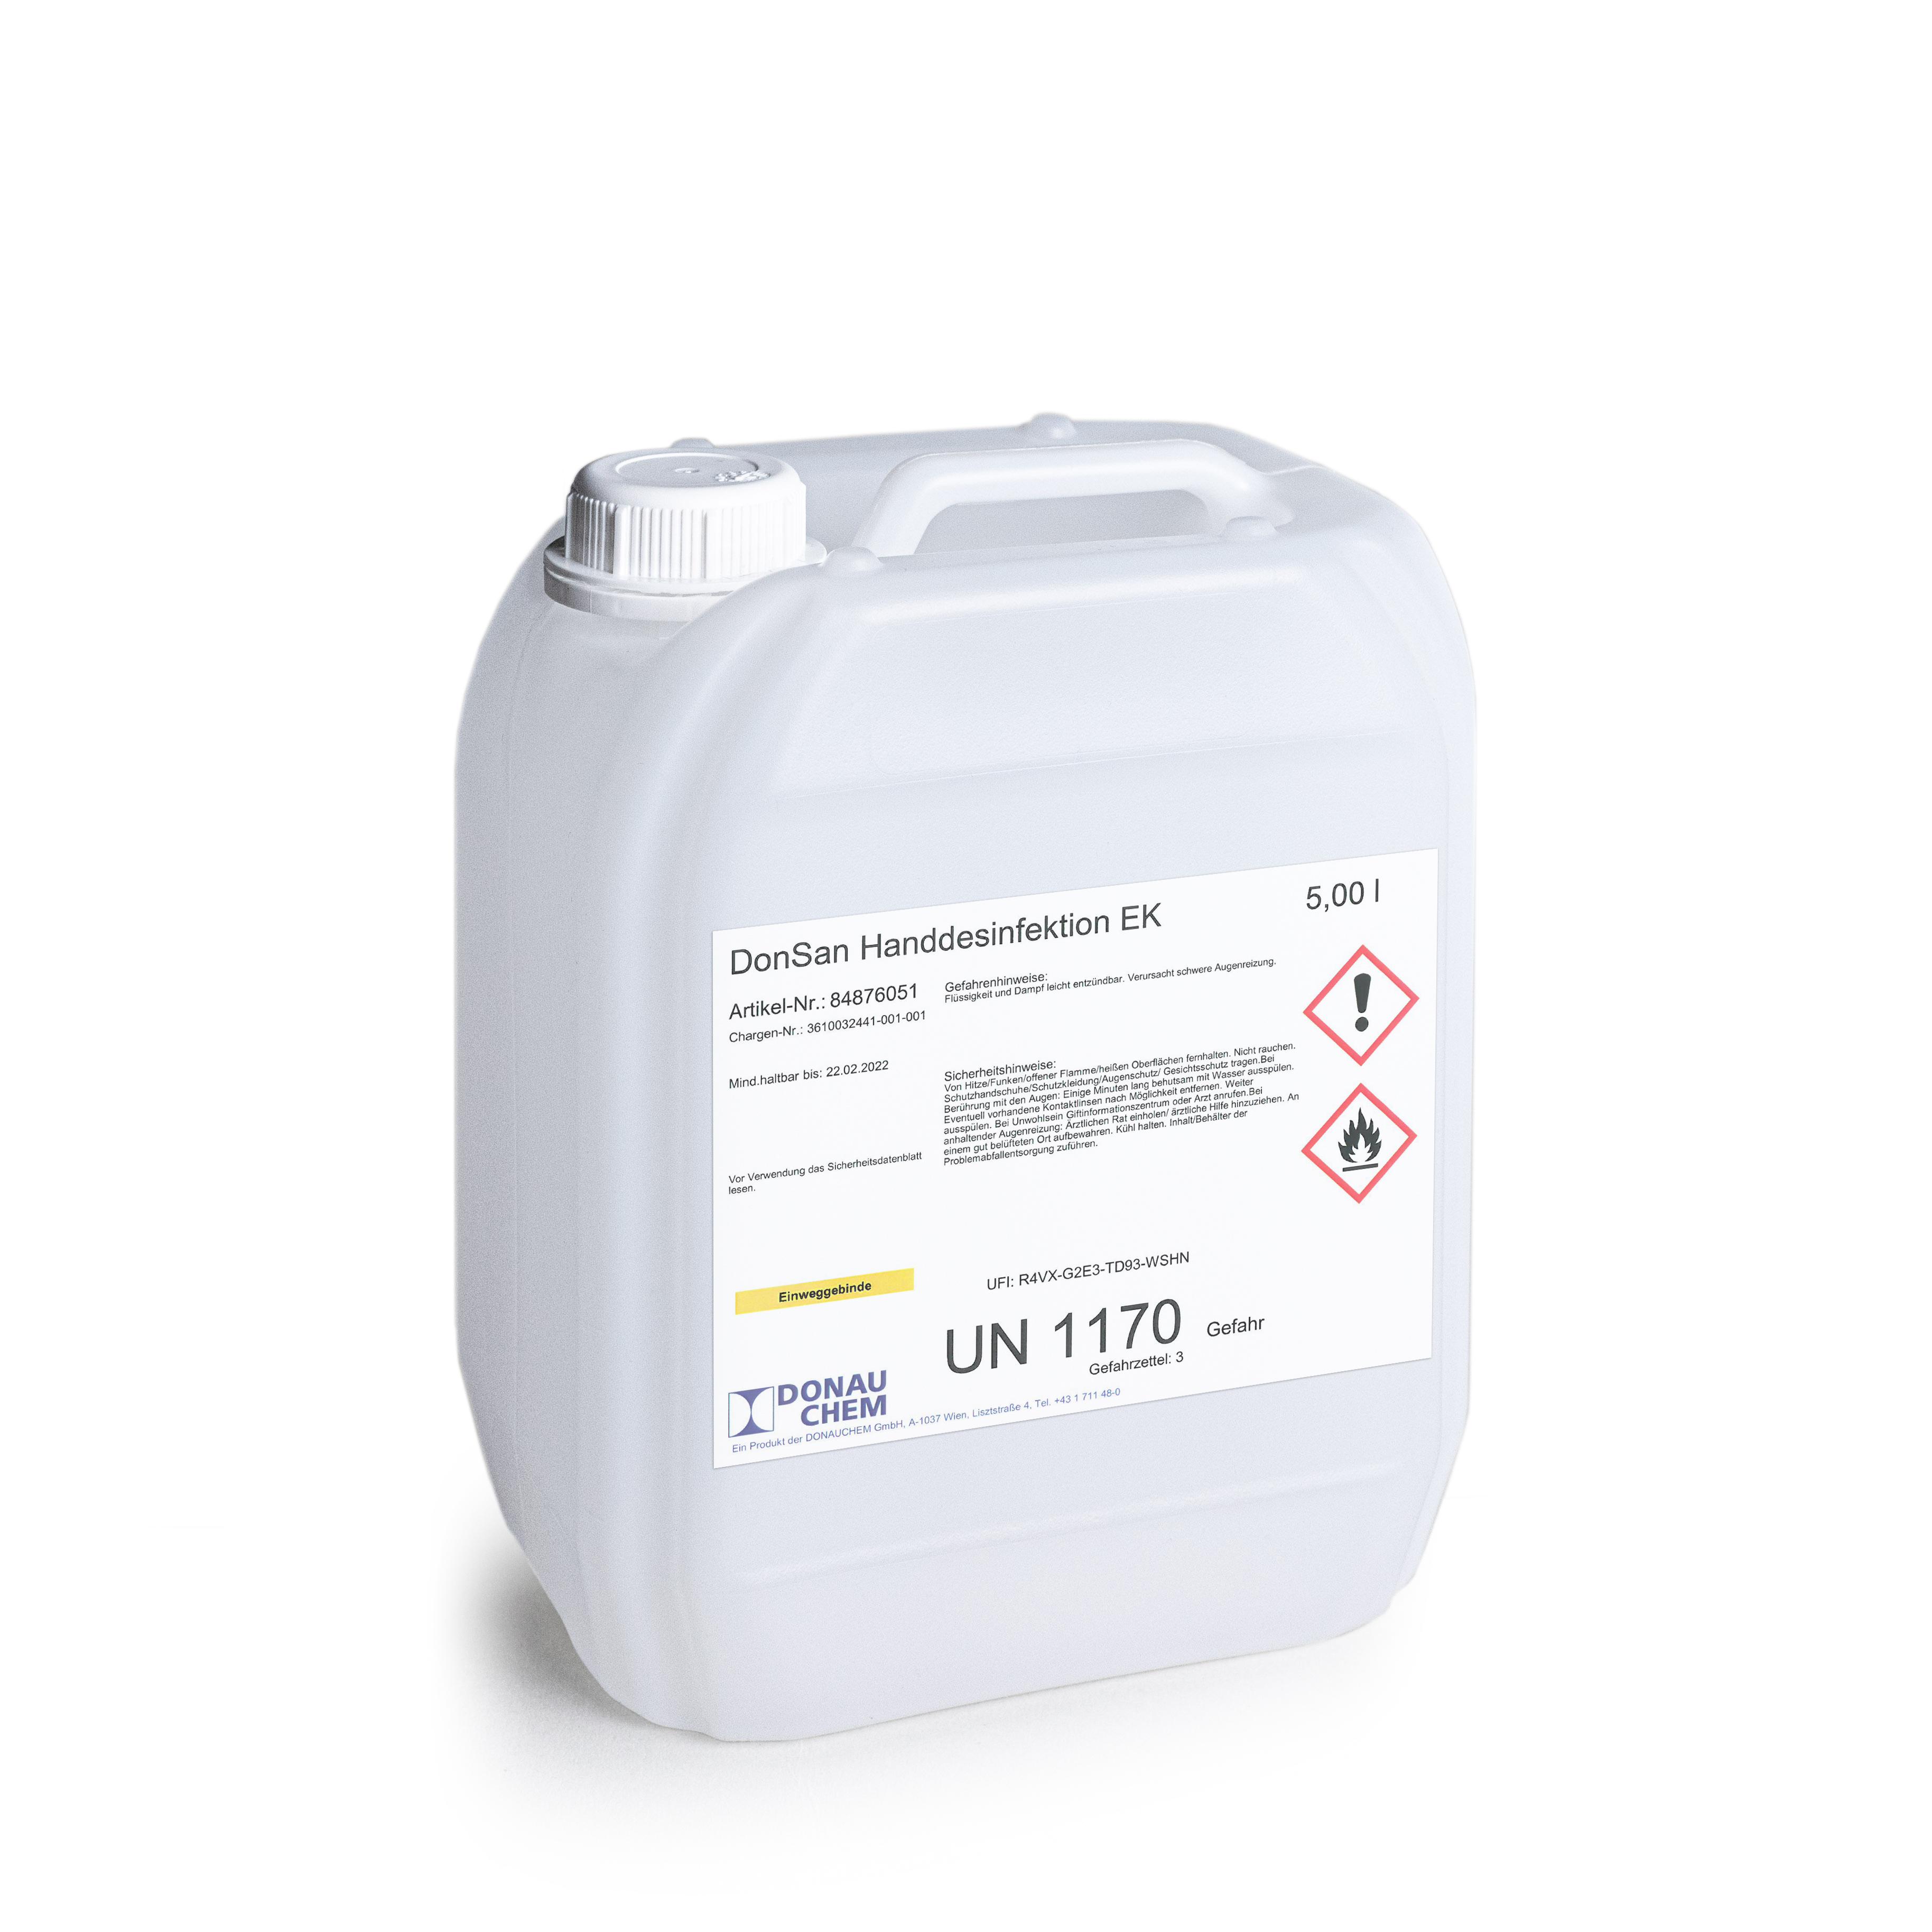 DonSan Handdesinfektionsmittel EK (Ethanol)